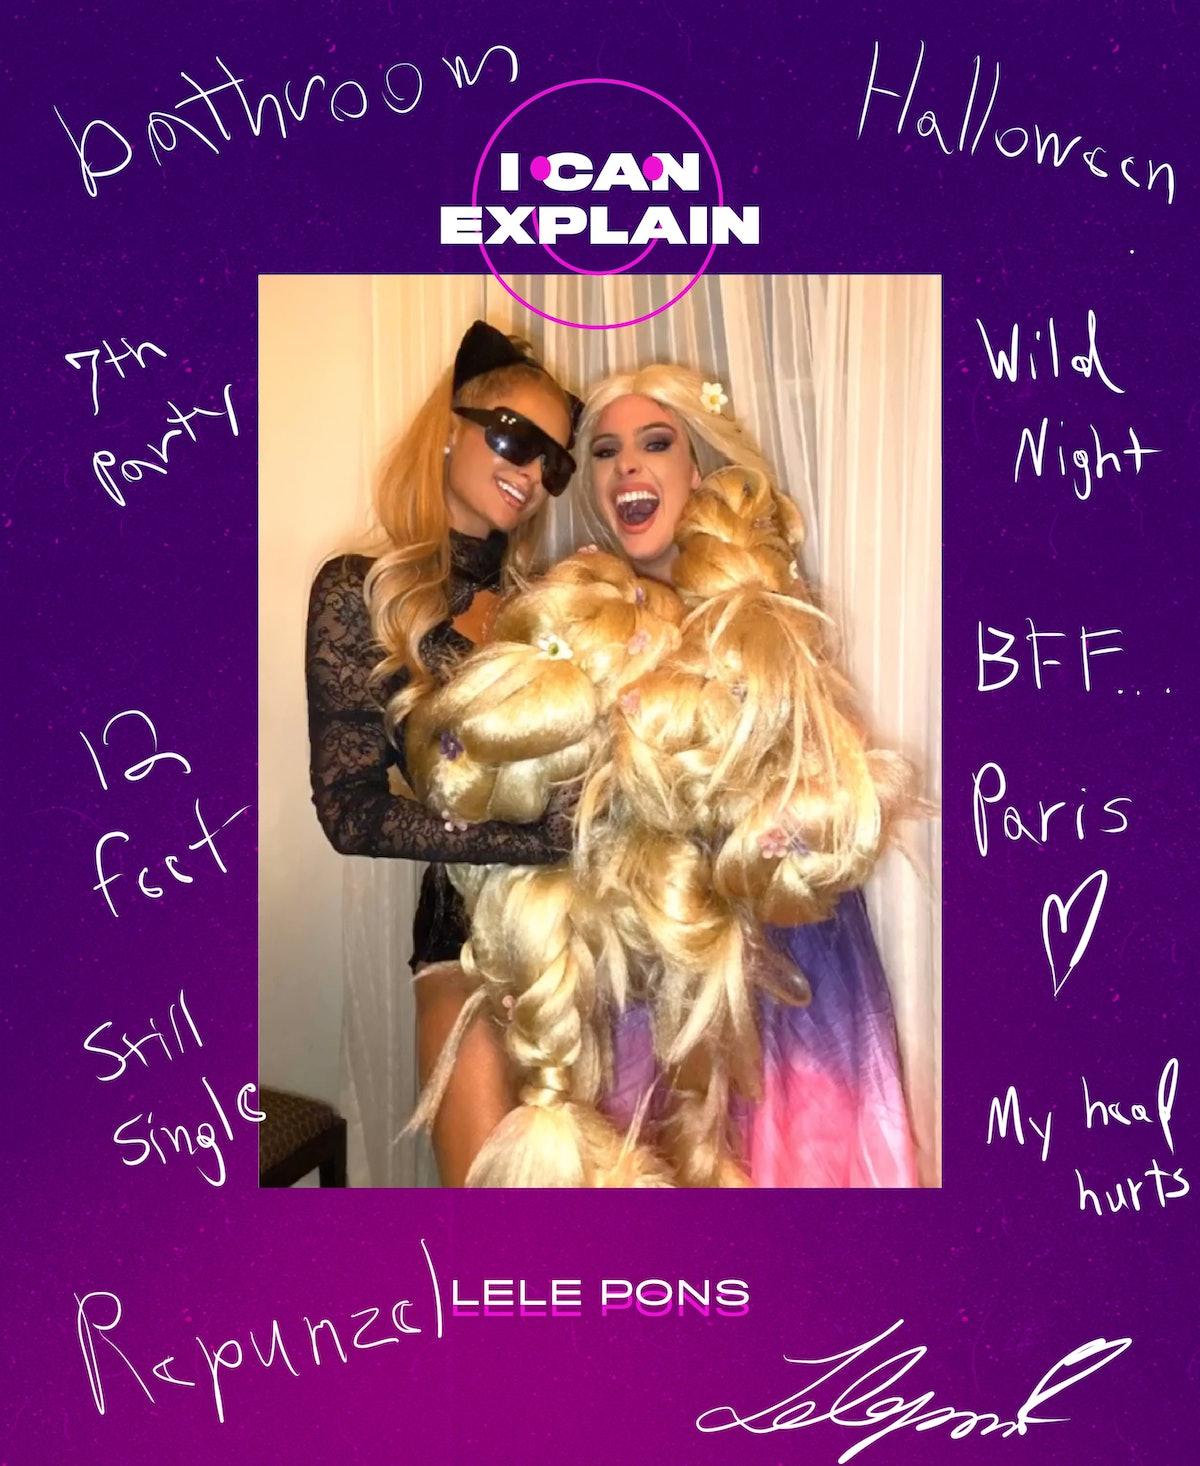 Lele Pons explains this photo with Paris Hilton for I Can Explain